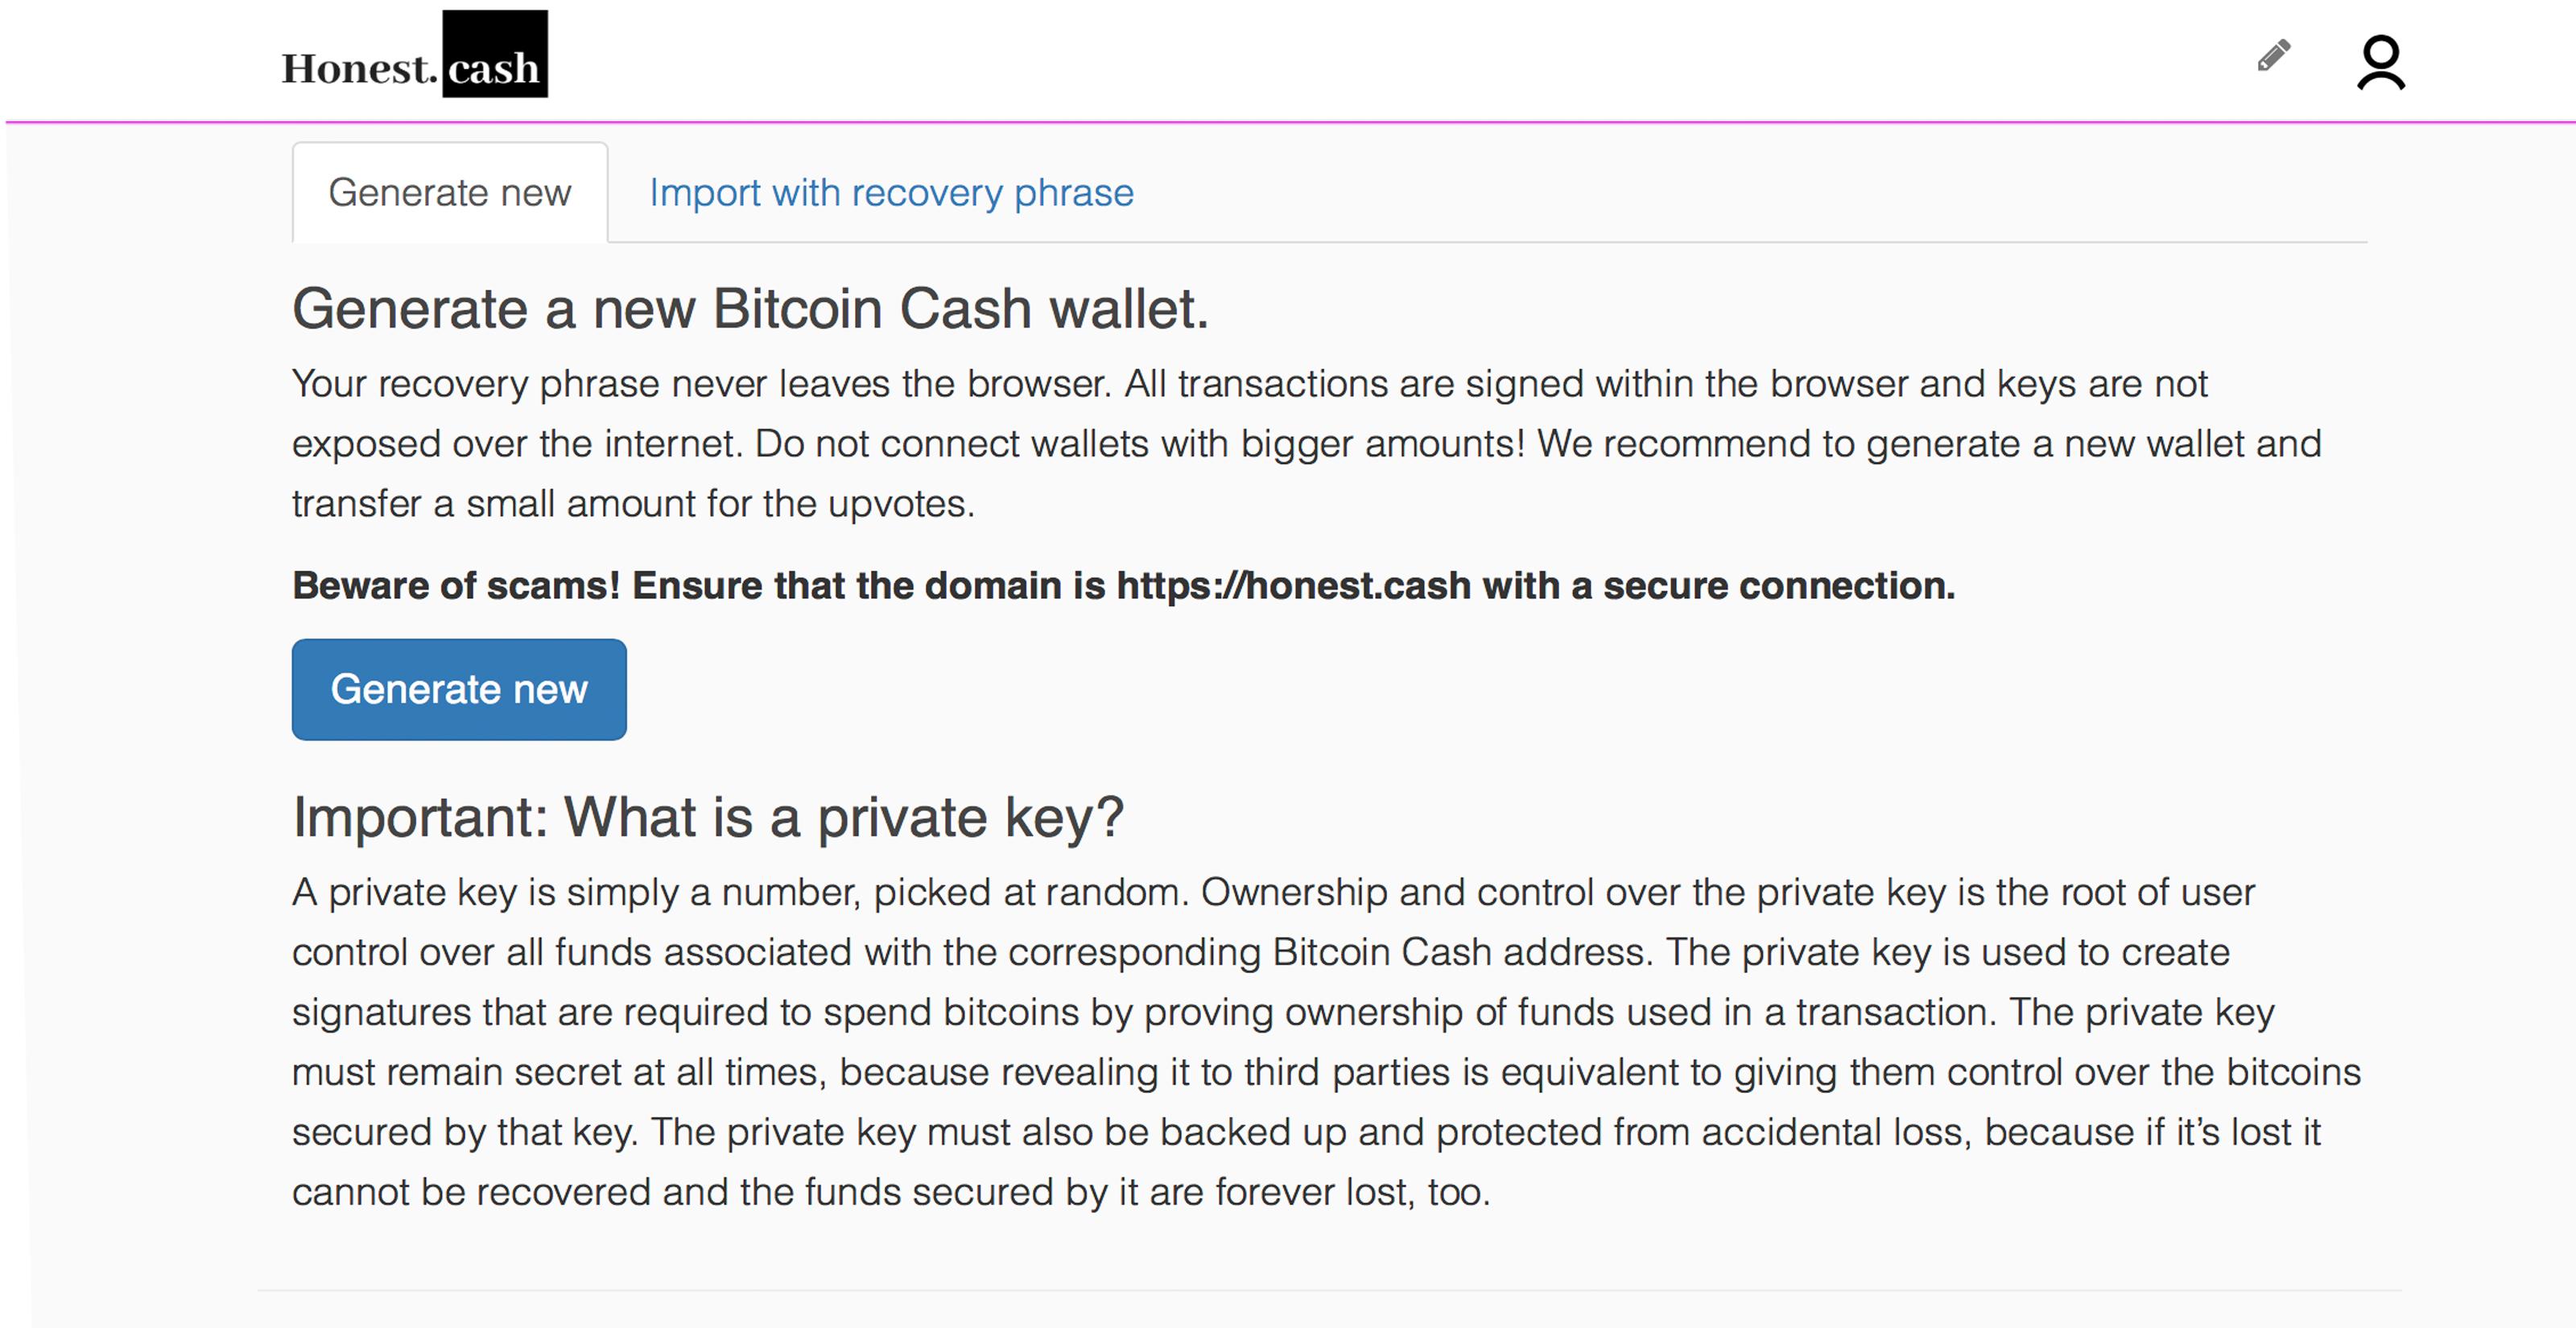 BCH App 'Honest Cash'が大幅な成長を見せ、ネイティブウォレットを追加